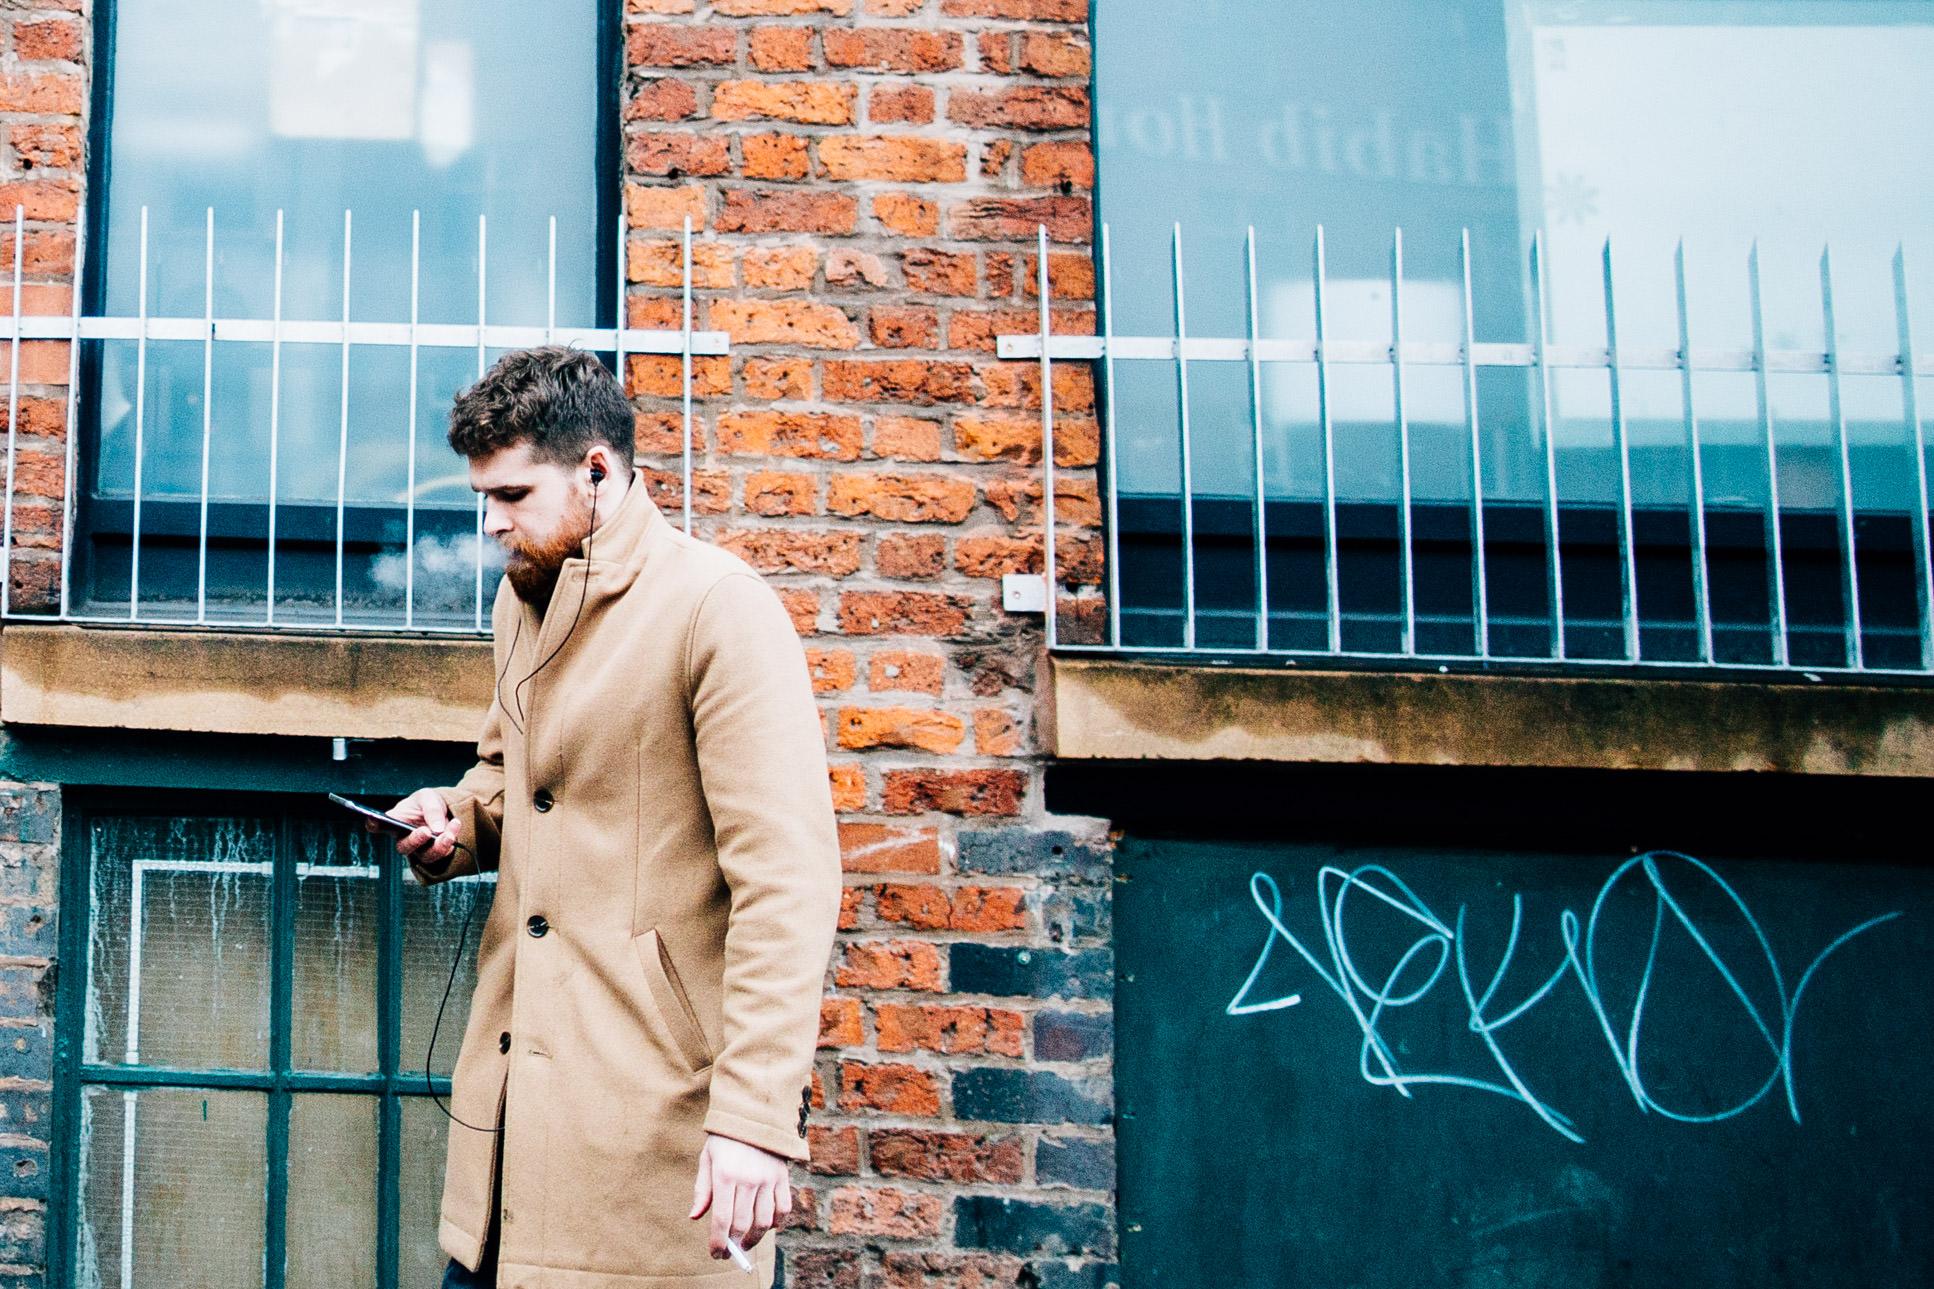 Street Photography26